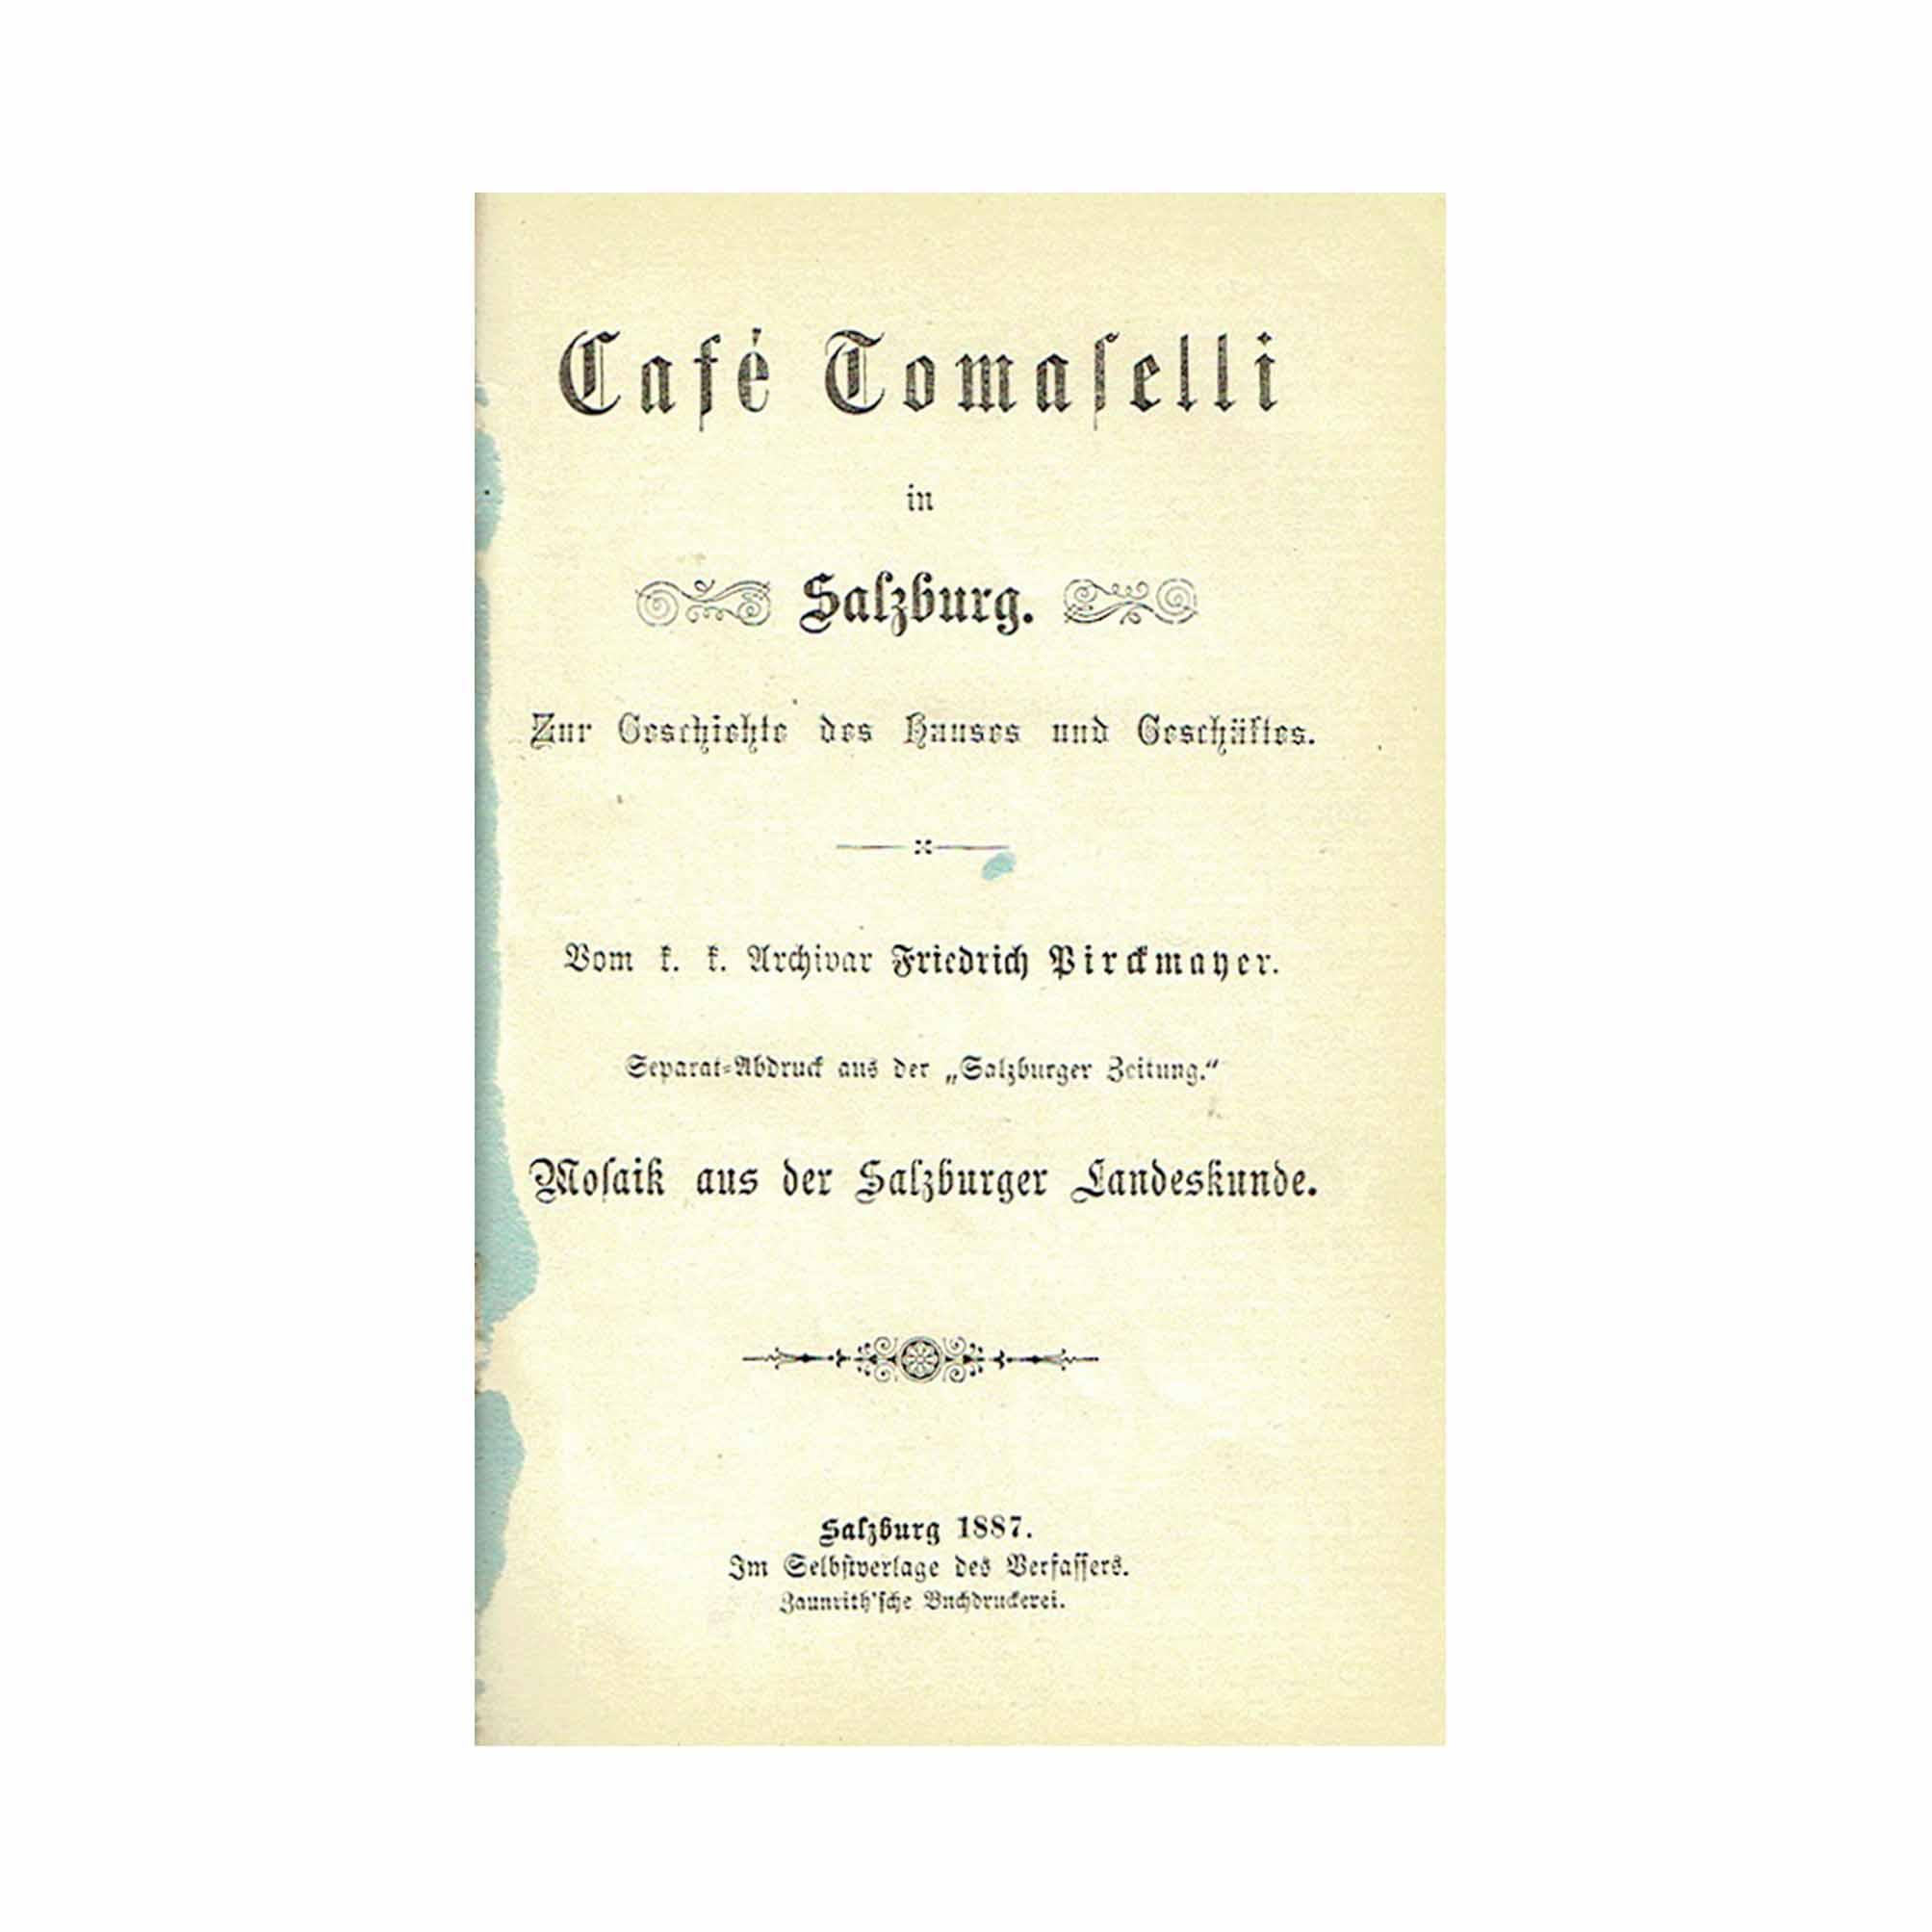 5862-Pirckmayer-Tomaselli-Salzburg-Sammelband-1887-Tomaselli-Titel-A-N.jpg